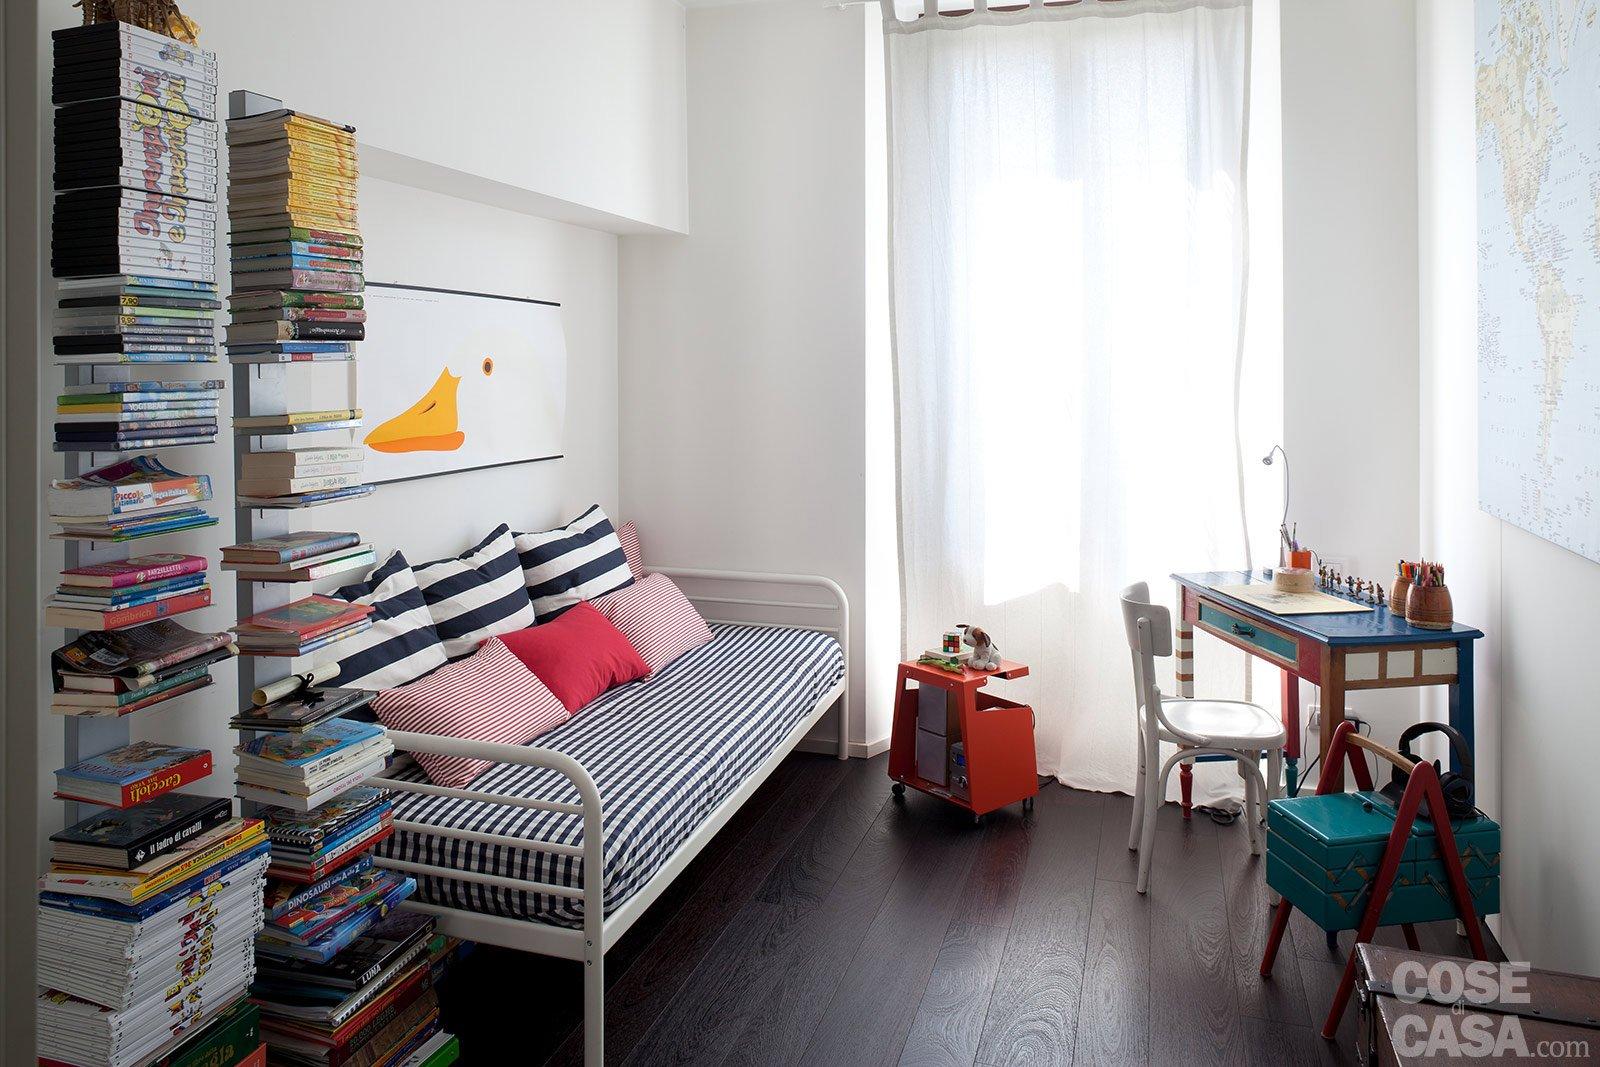 Camera Ospiti Per Vano Cucina : 70 mq: la casa migliora così cose di casa